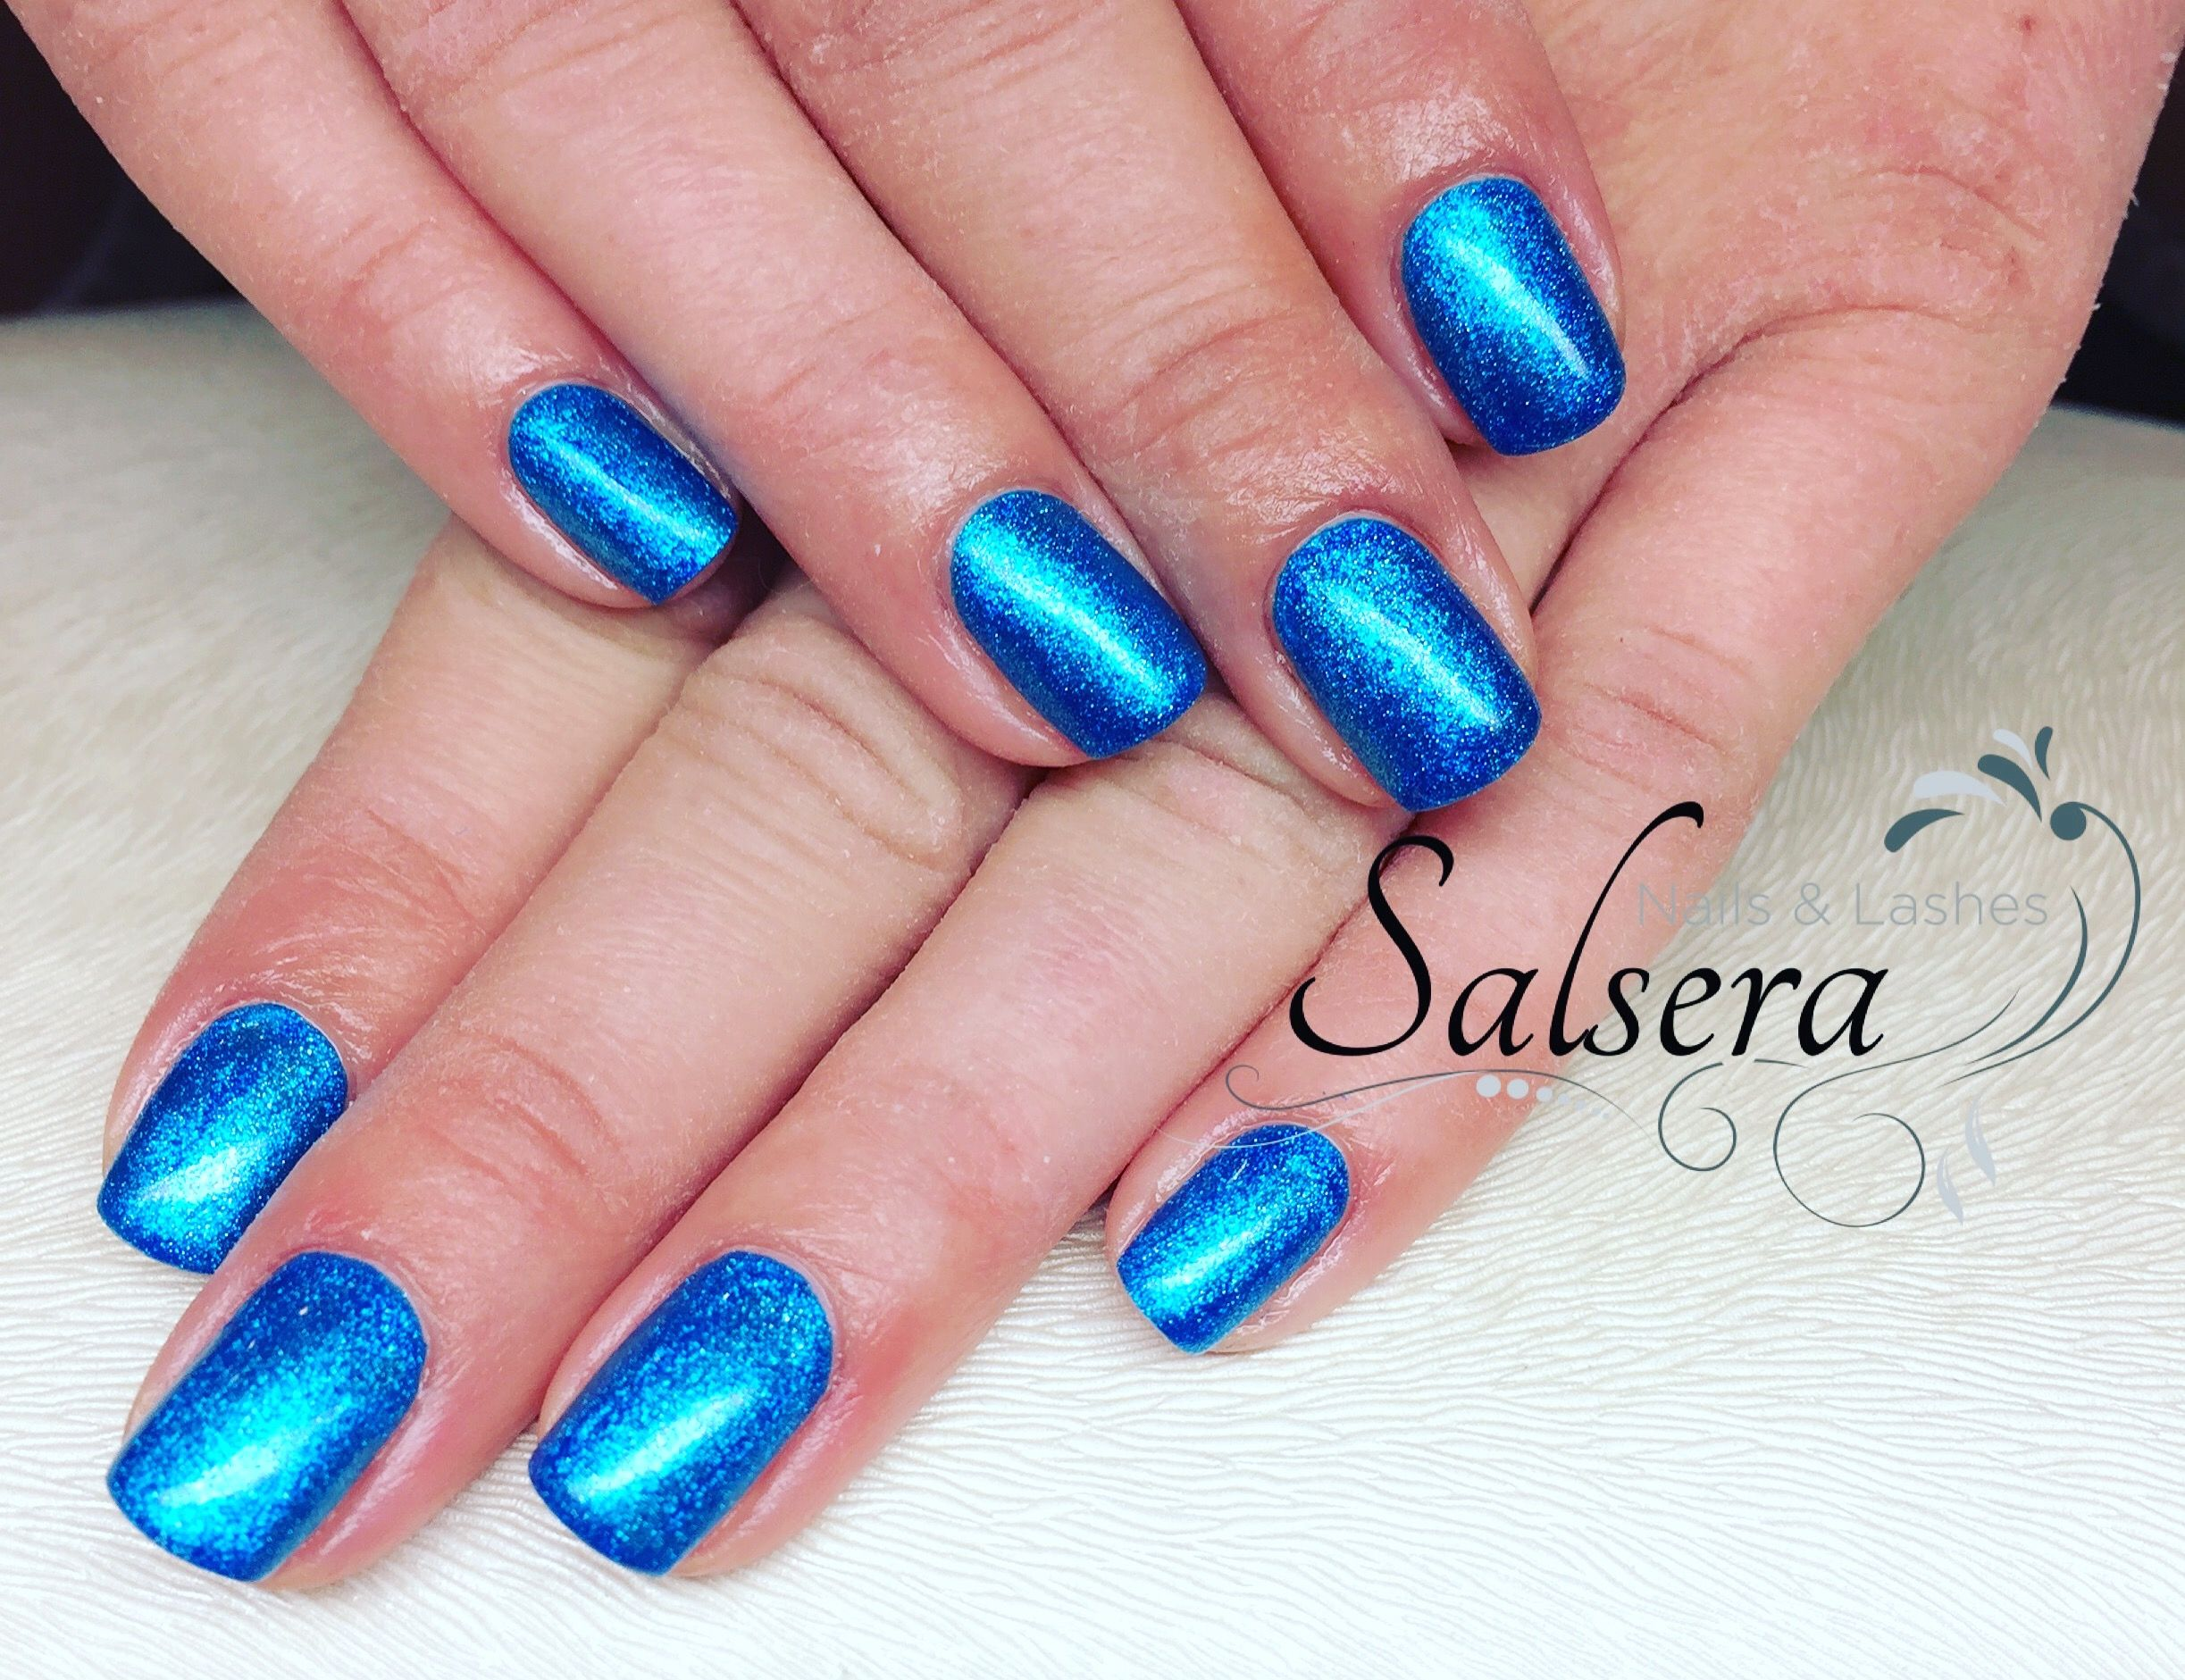 Nails Nägel Nageldesign blau Fullcover Shortnails Salsera Nails ...